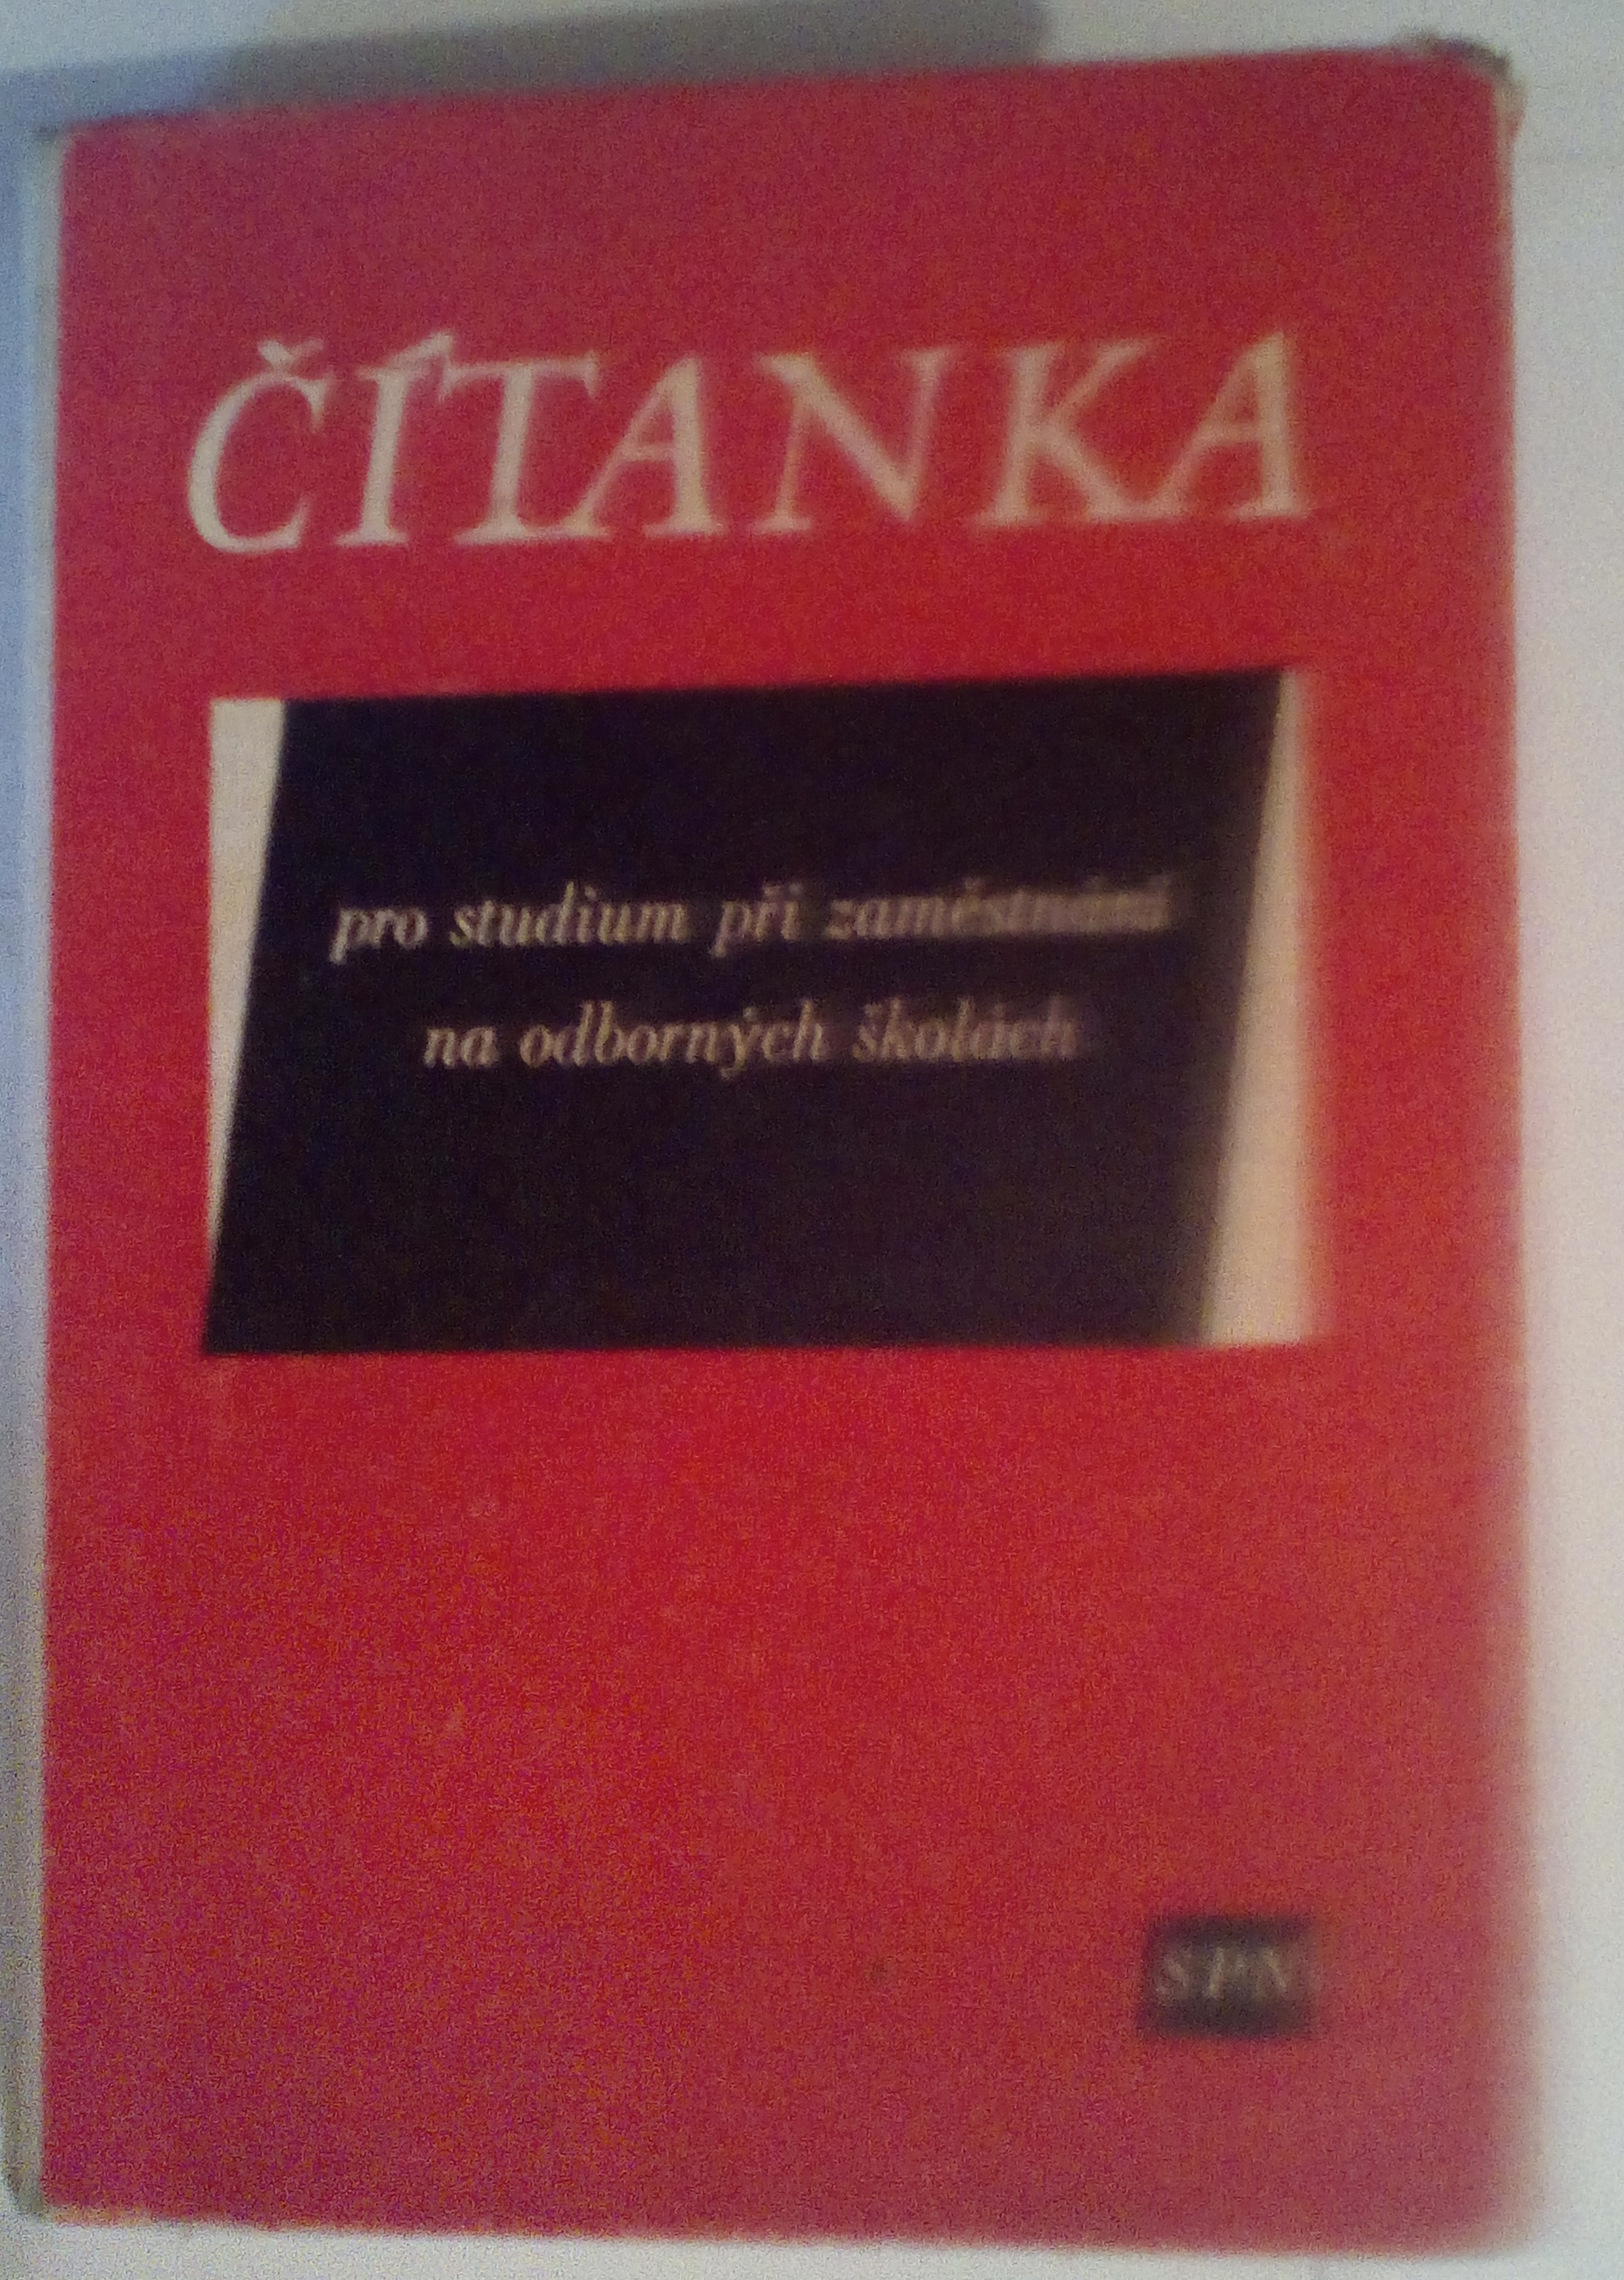 Čítanka - Otakar Hönig, Václav Kamelský, Vilém Pech